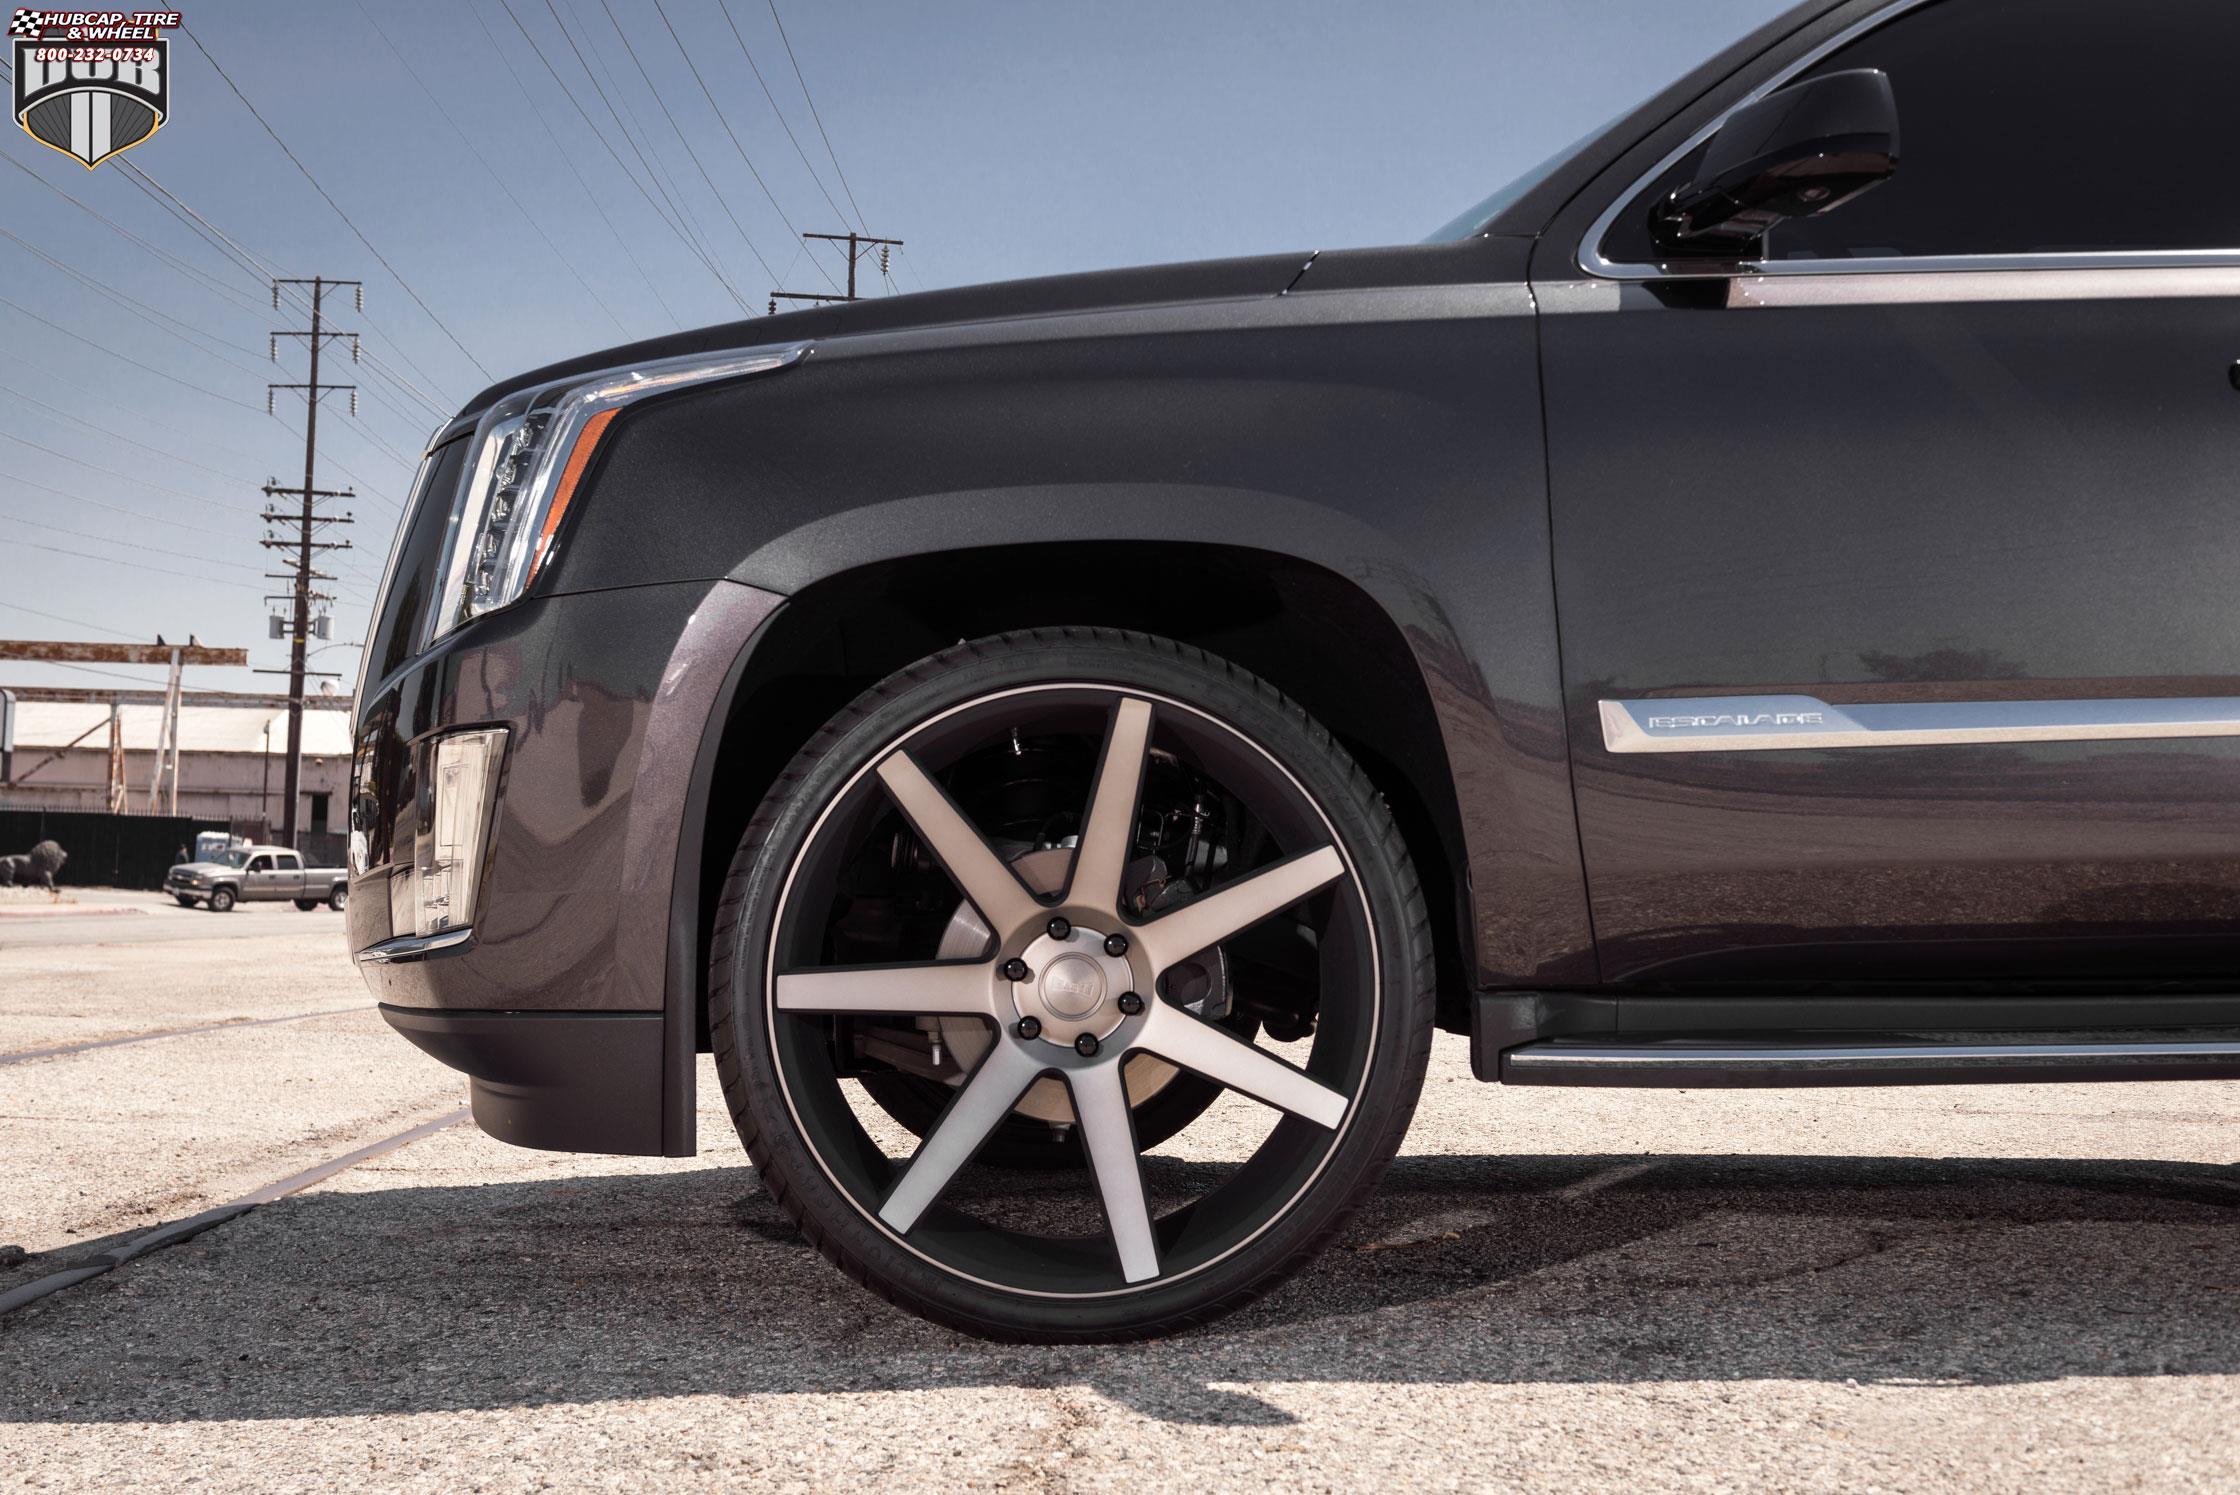 black and wheels models custom chrome rims elite w inch tire rim diablo escalade on diabloeliteescalade cadillac packages specs